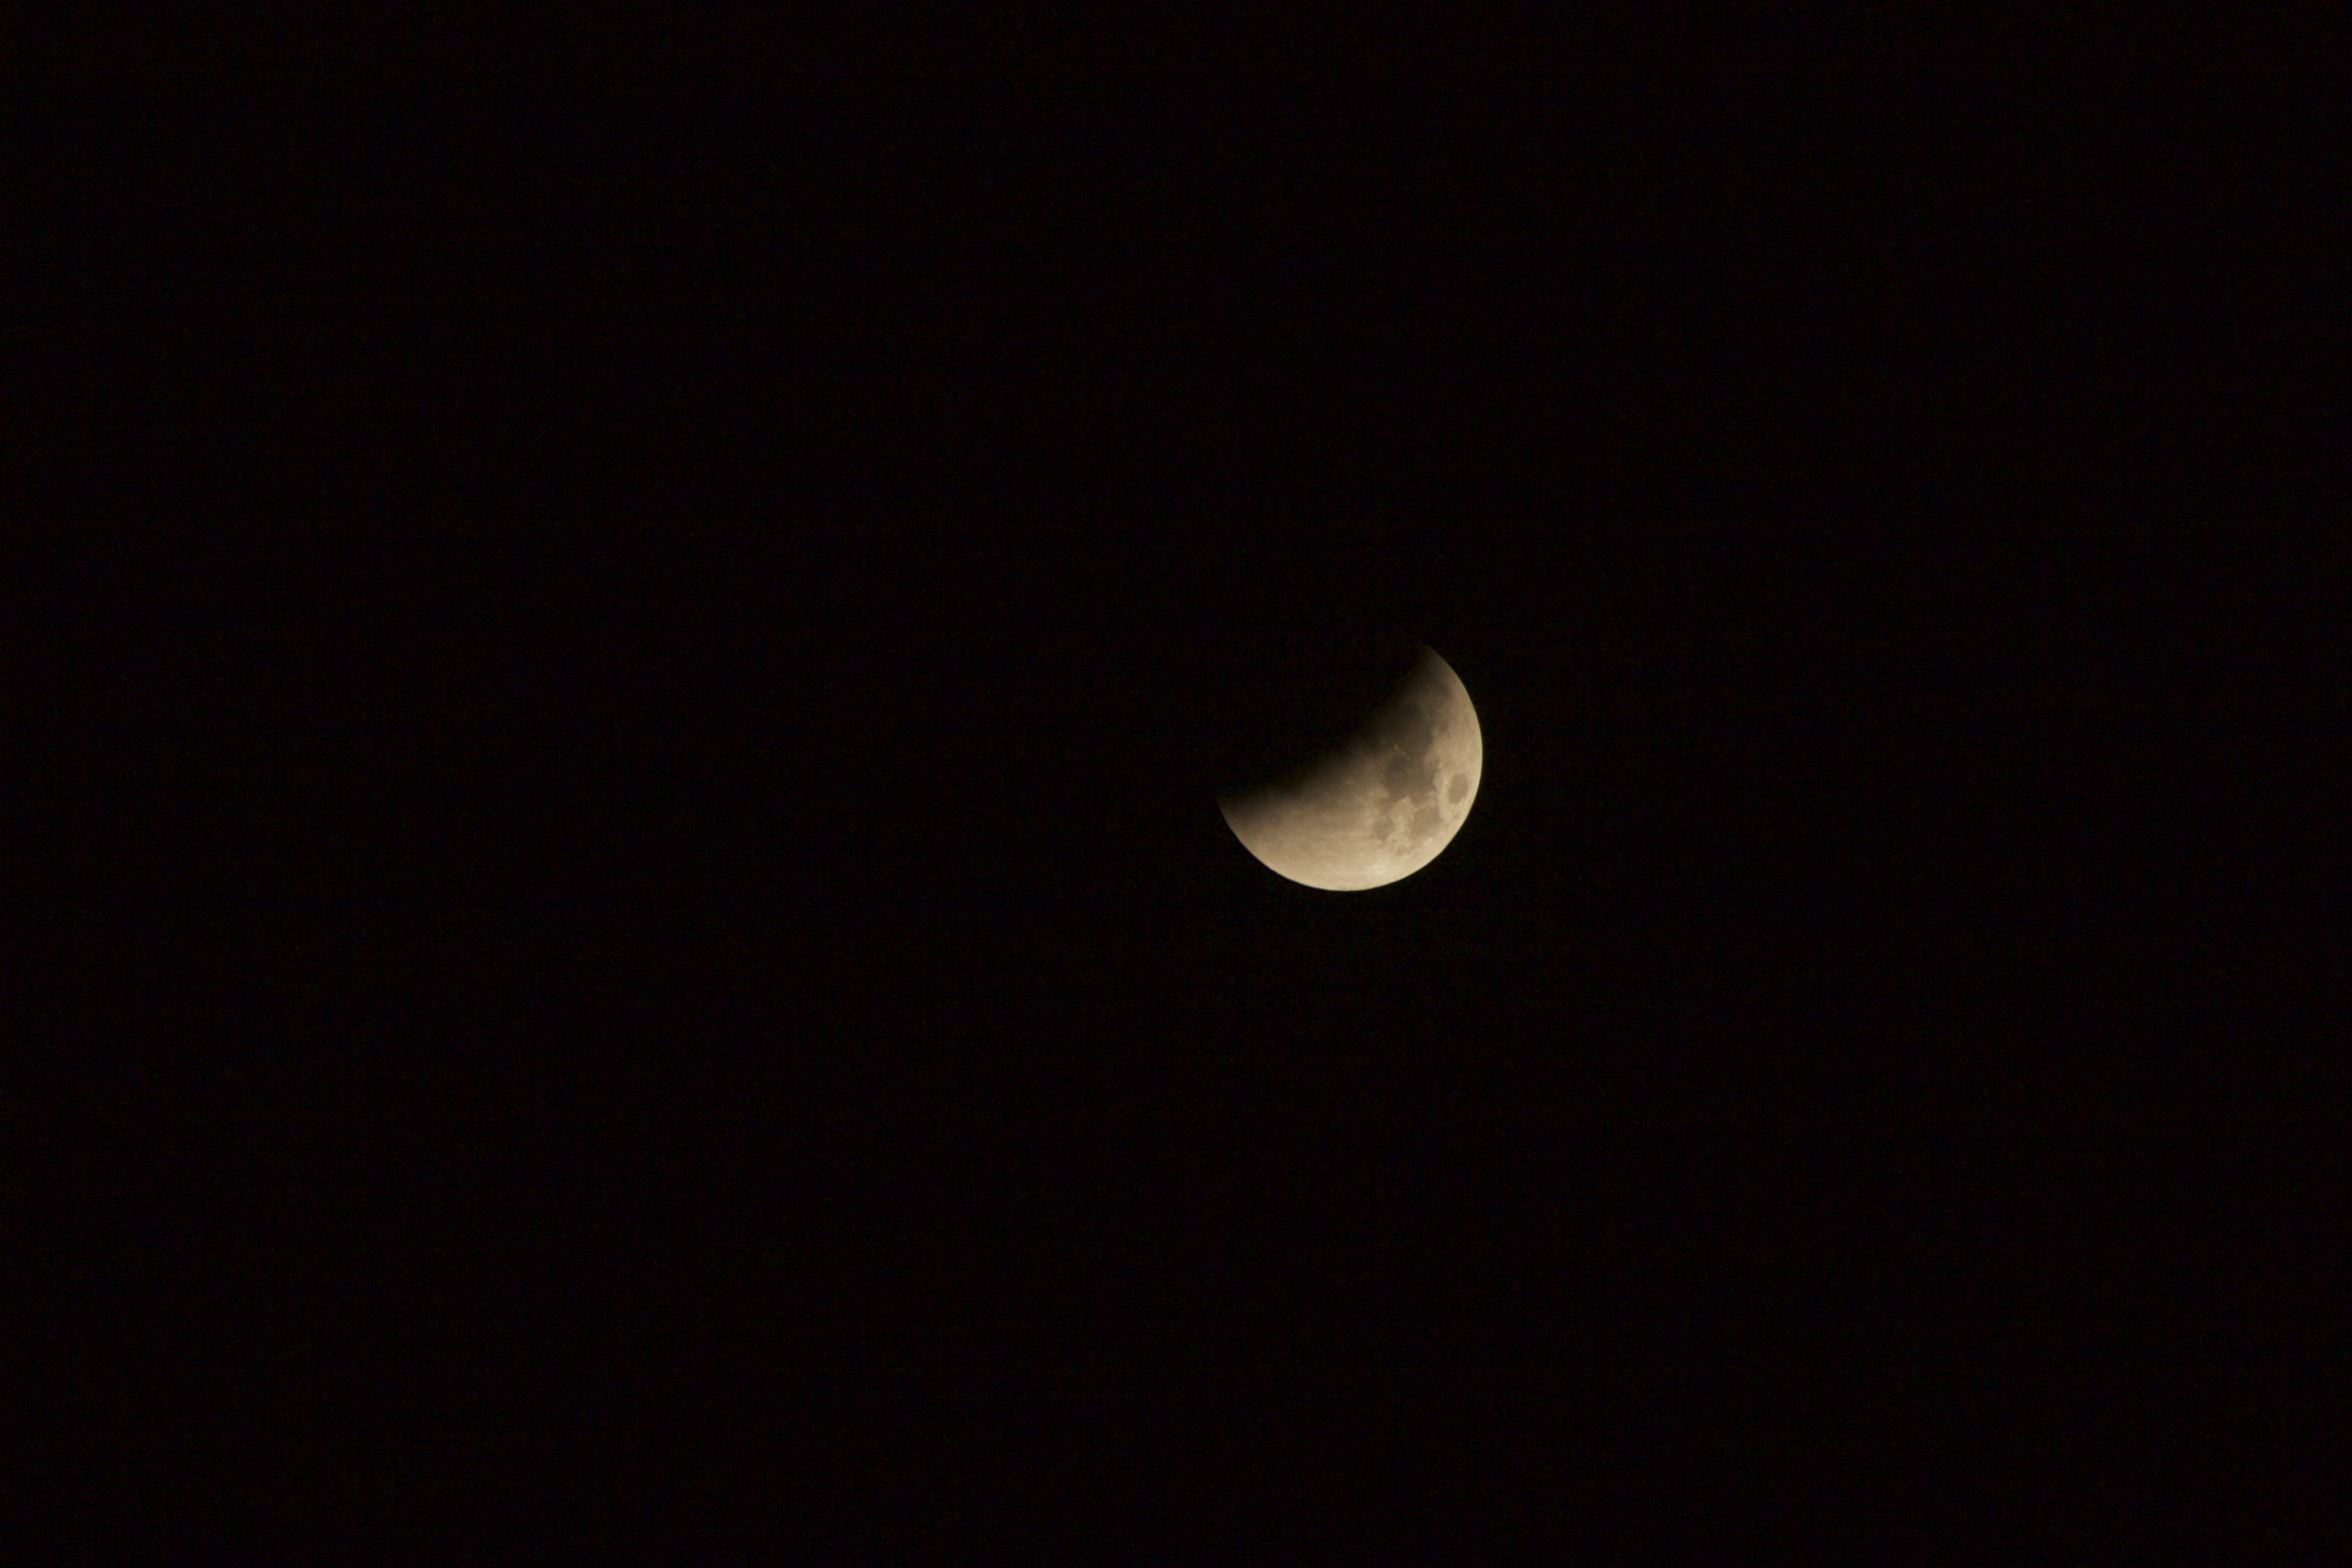 red moon tonight july 19 2019 - photo #35